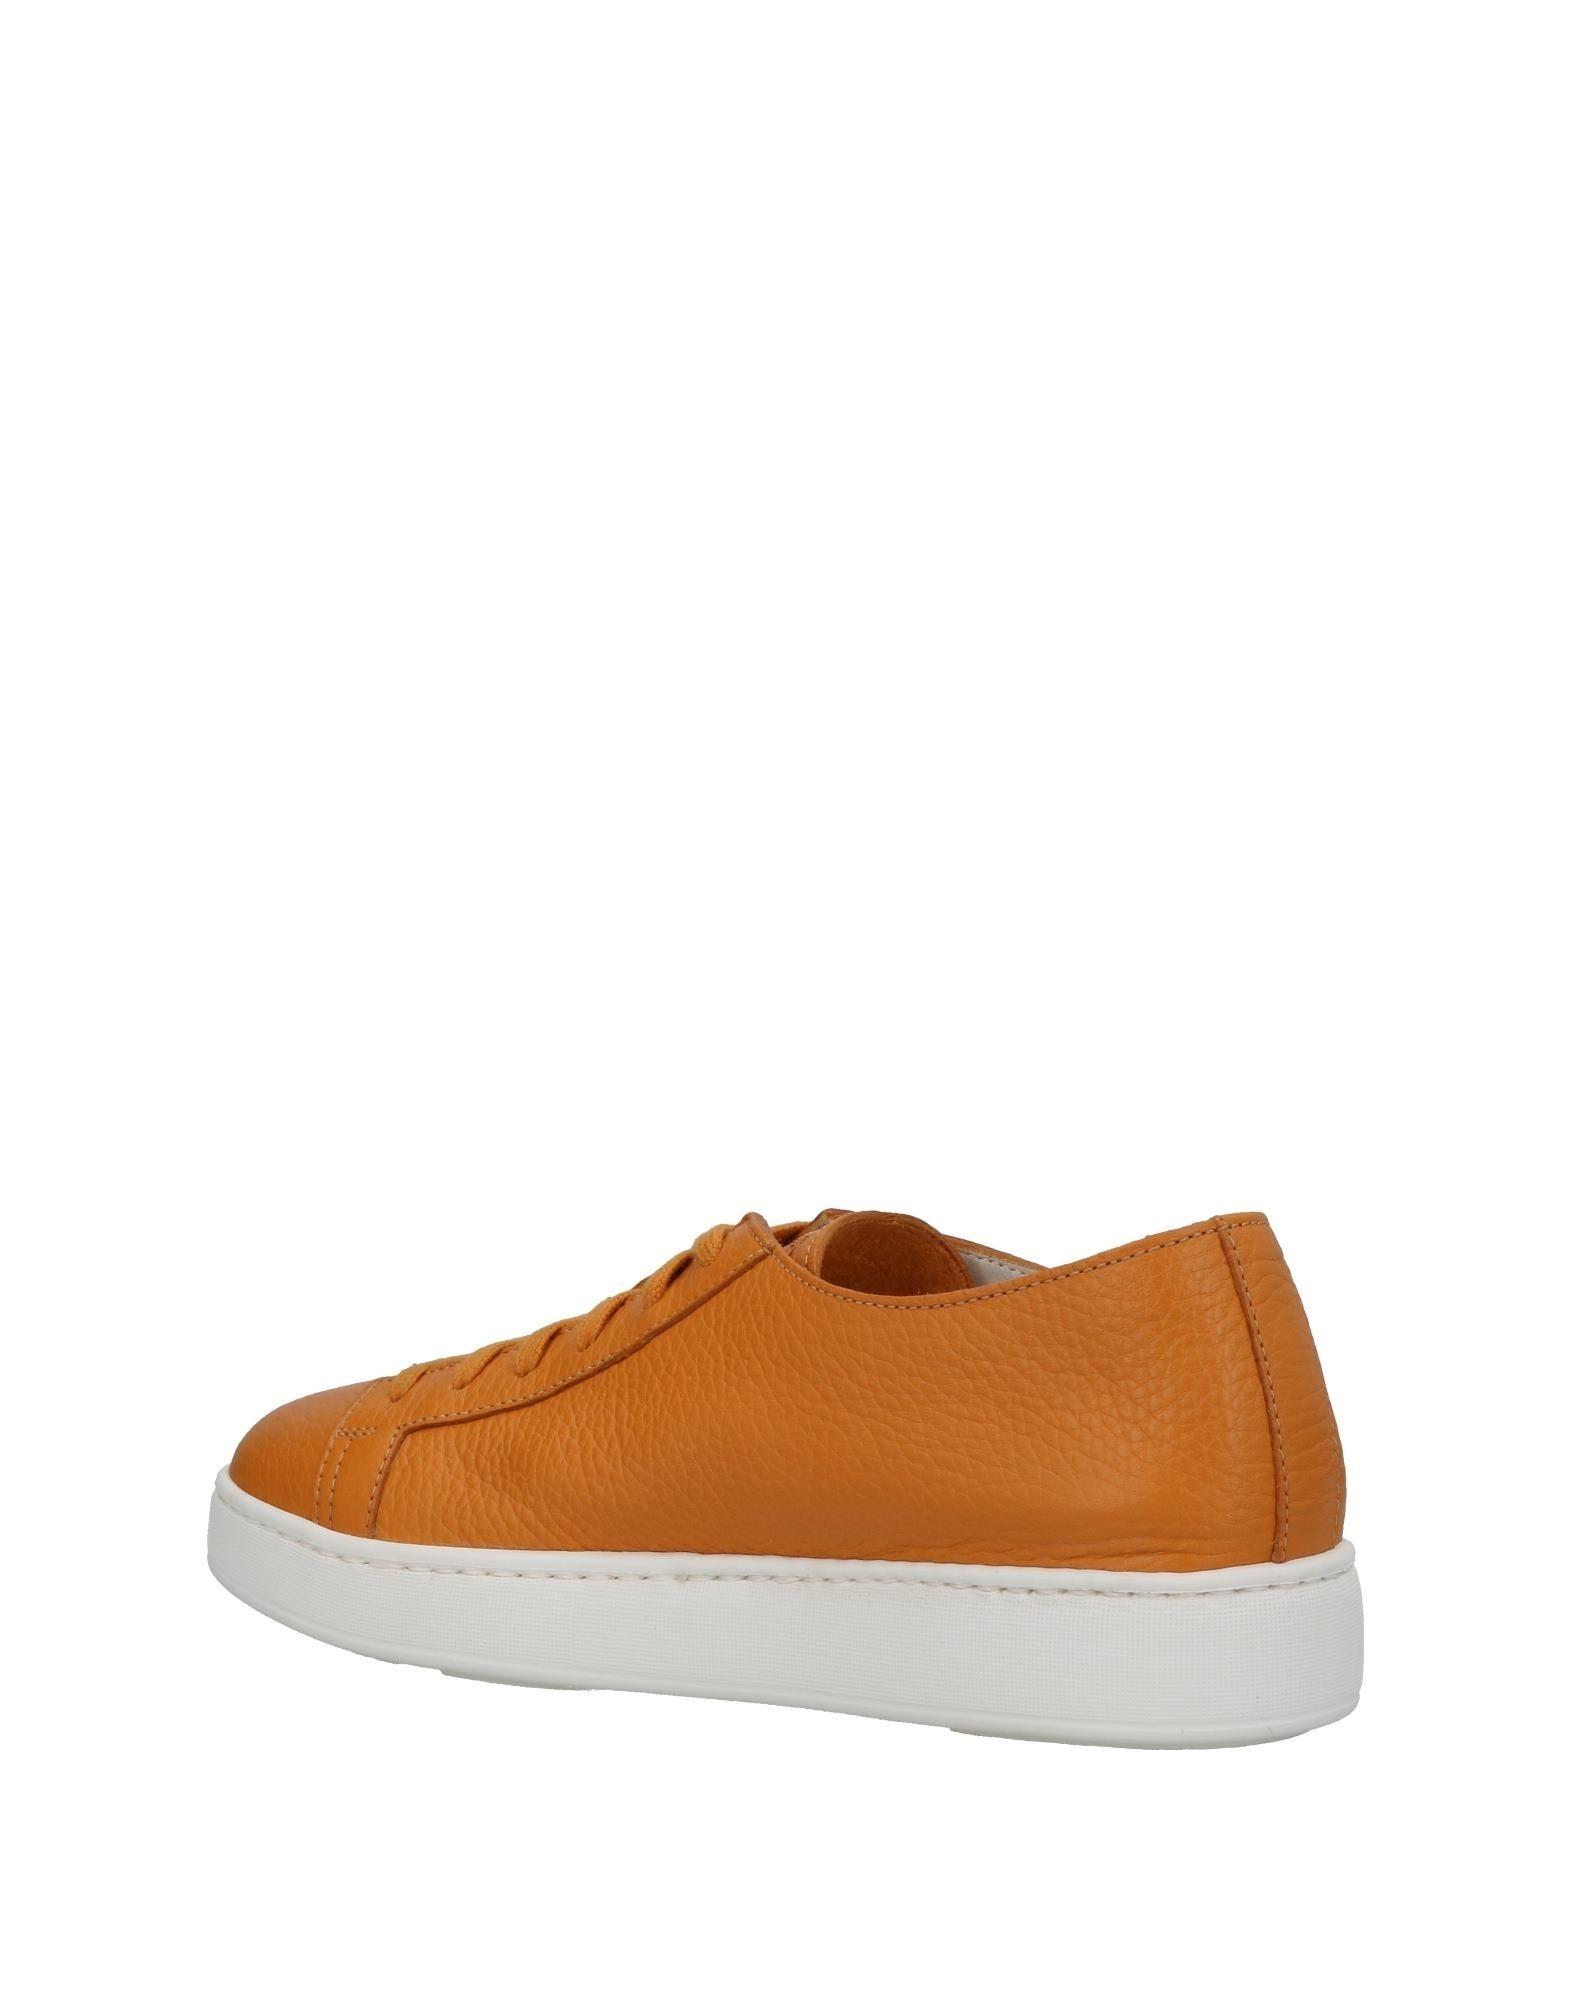 Santoni Sneakers Damen Damen Damen  11387312PQ Heiße Schuhe 4a616f